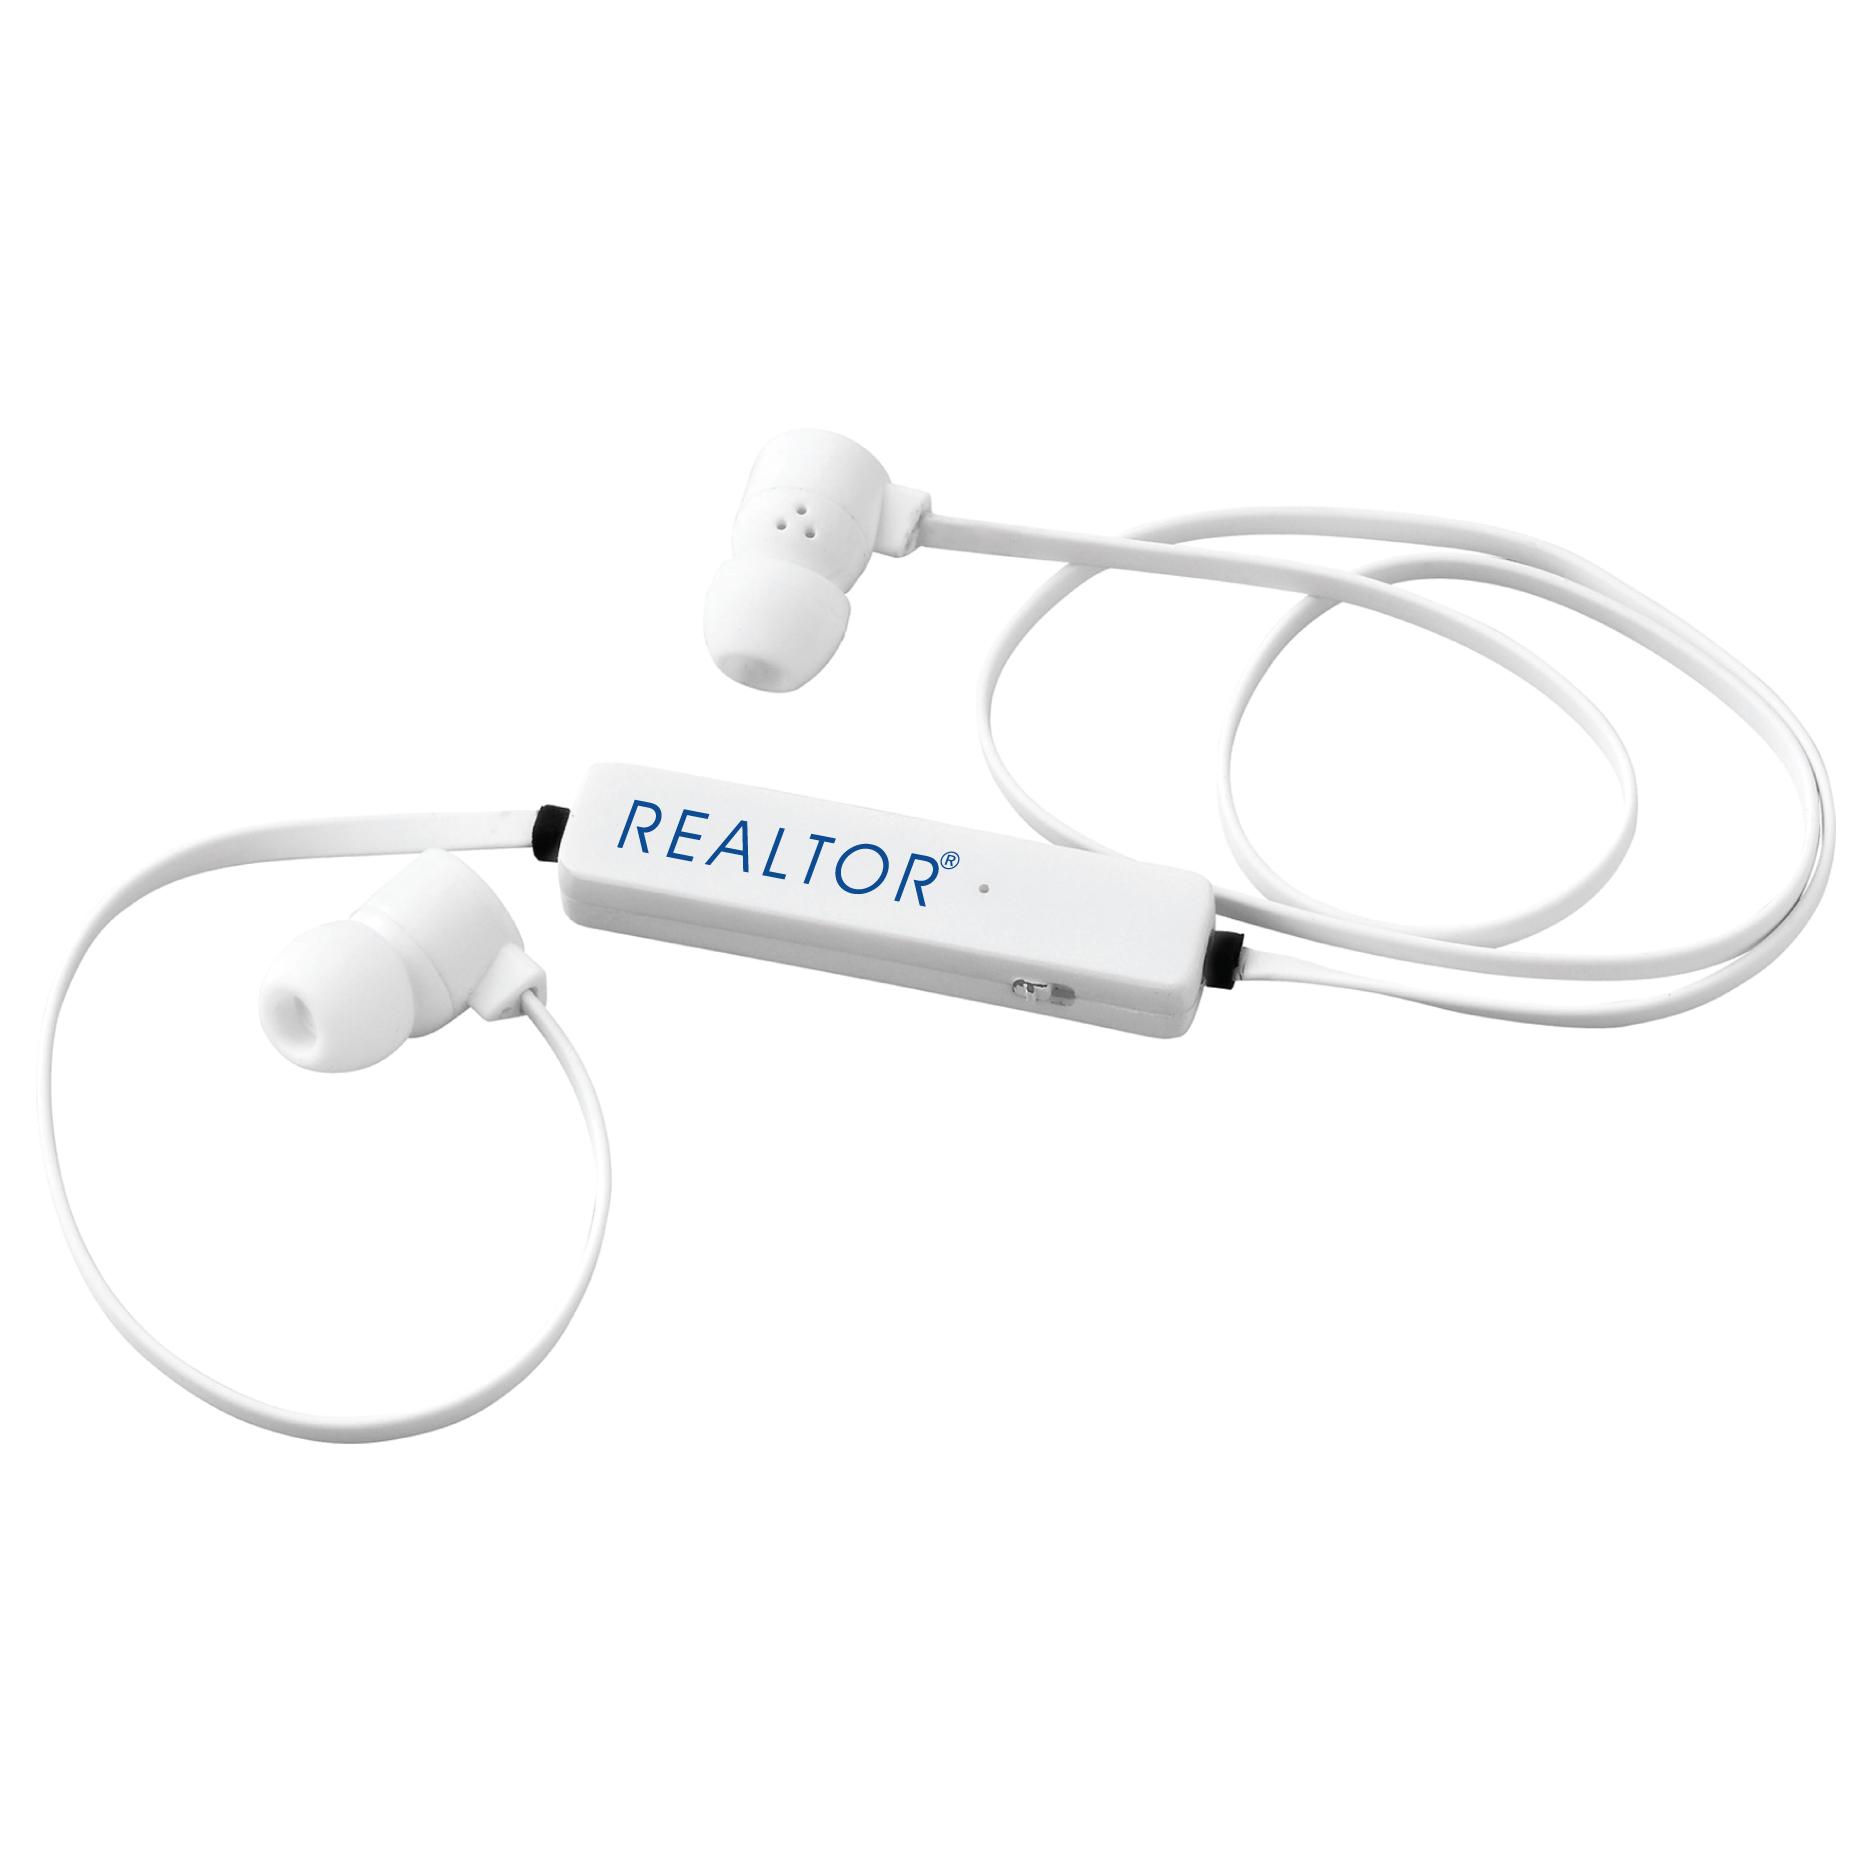 Bluetooth Earbuds Bluetooths,Earbuds,Earbudz,Headphones,Speakers,Musics,Heads,Phones,